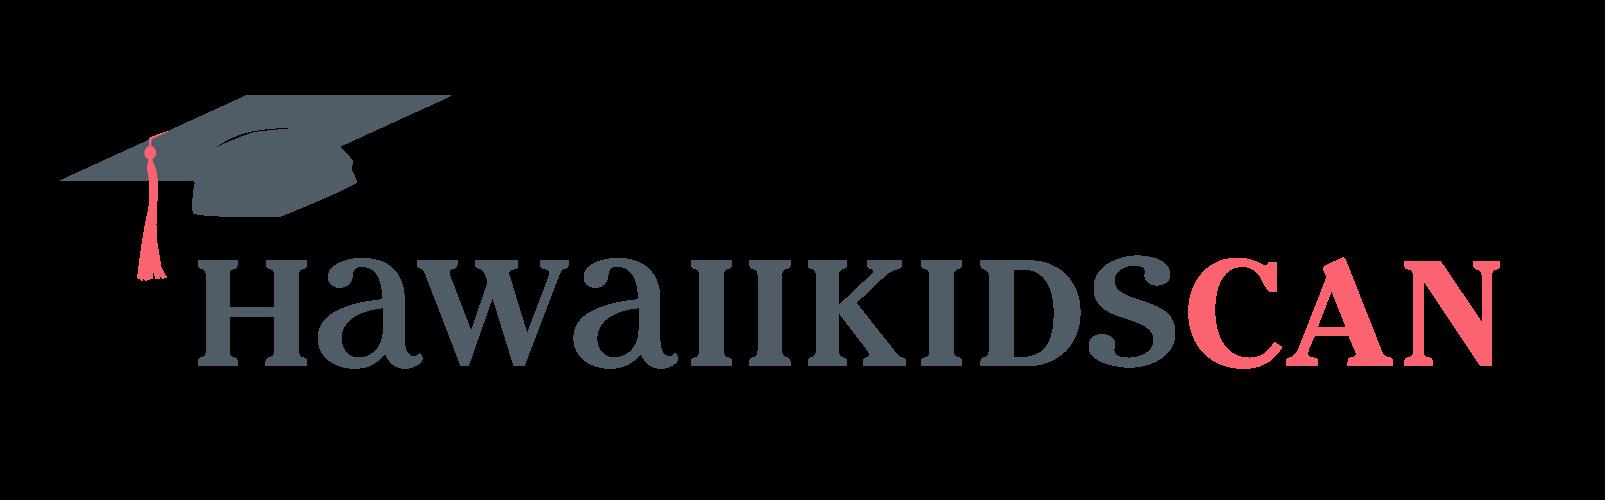 HawaiiKidsCAN-logo-RGB-1-1.png